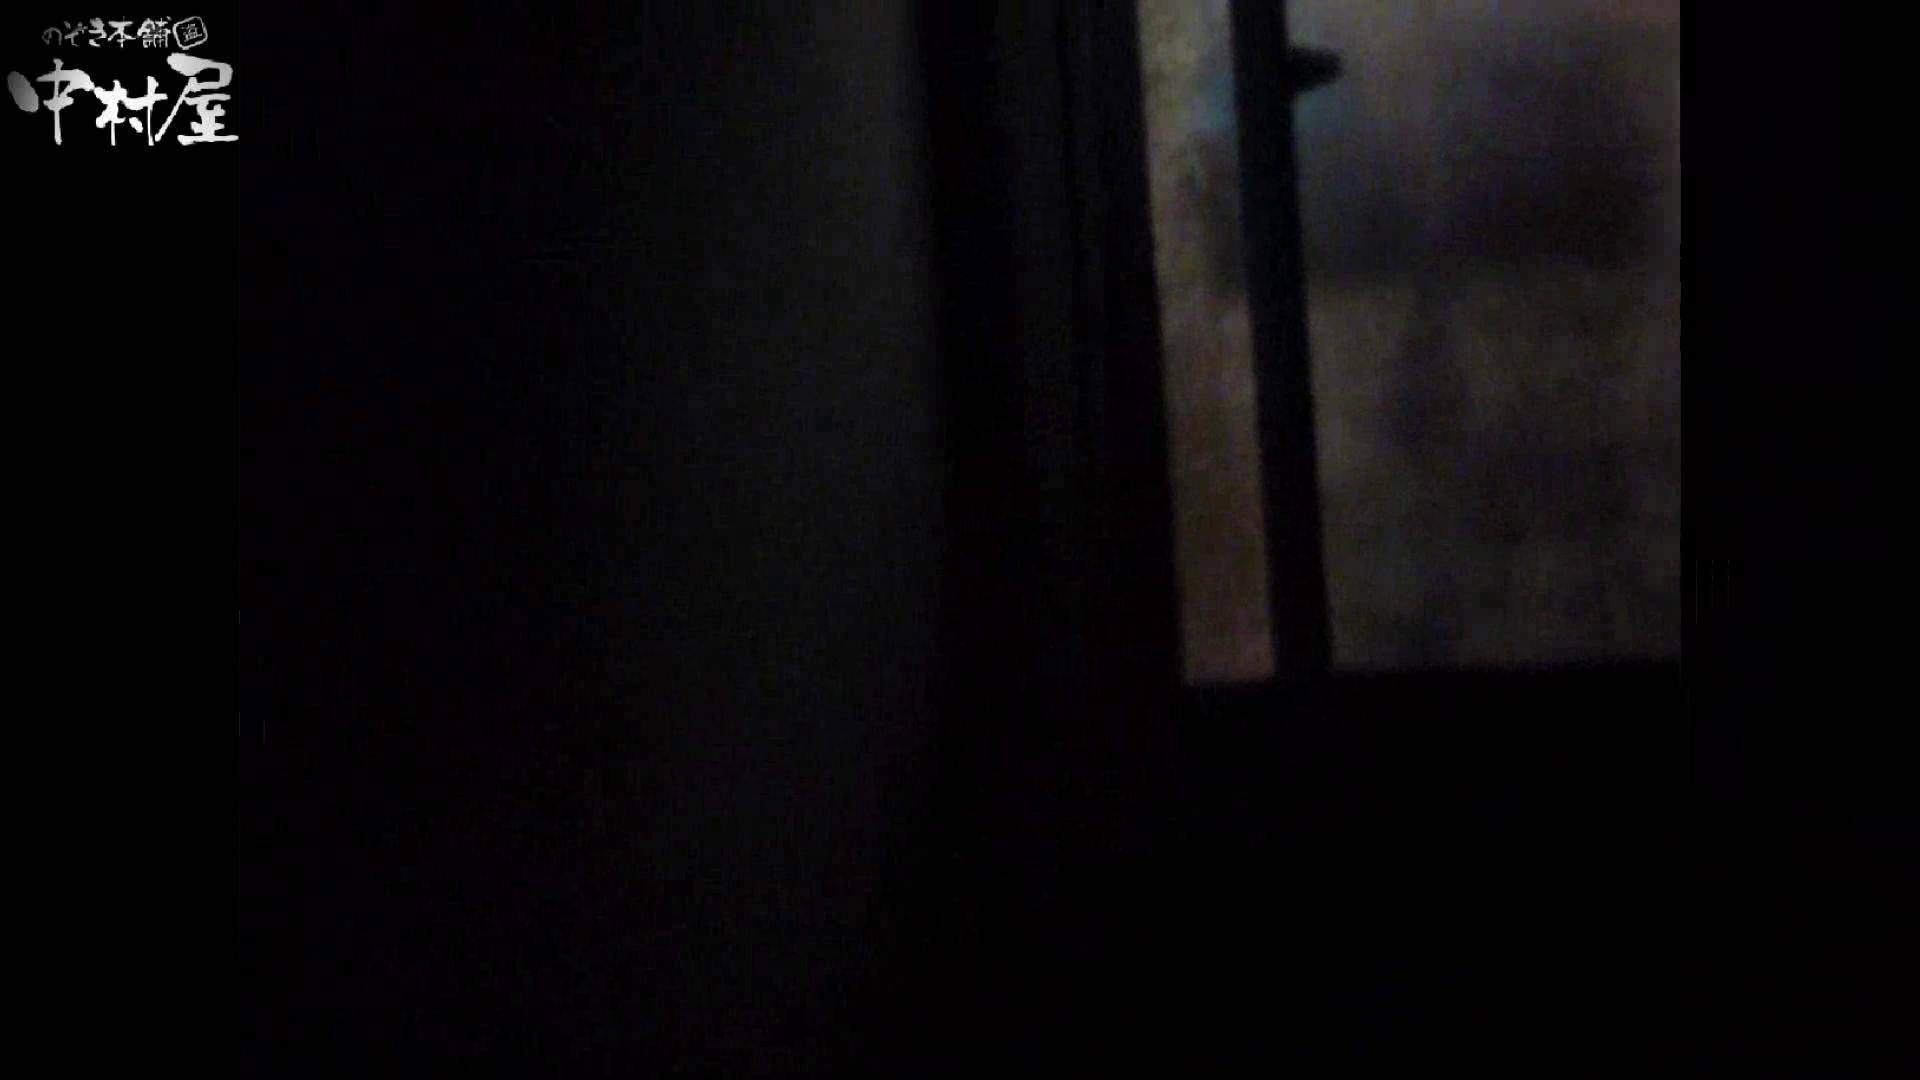 民家風呂専門盗撮師の超危険映像 vol.023 OLのエロ生活 性交動画流出 95連発 44